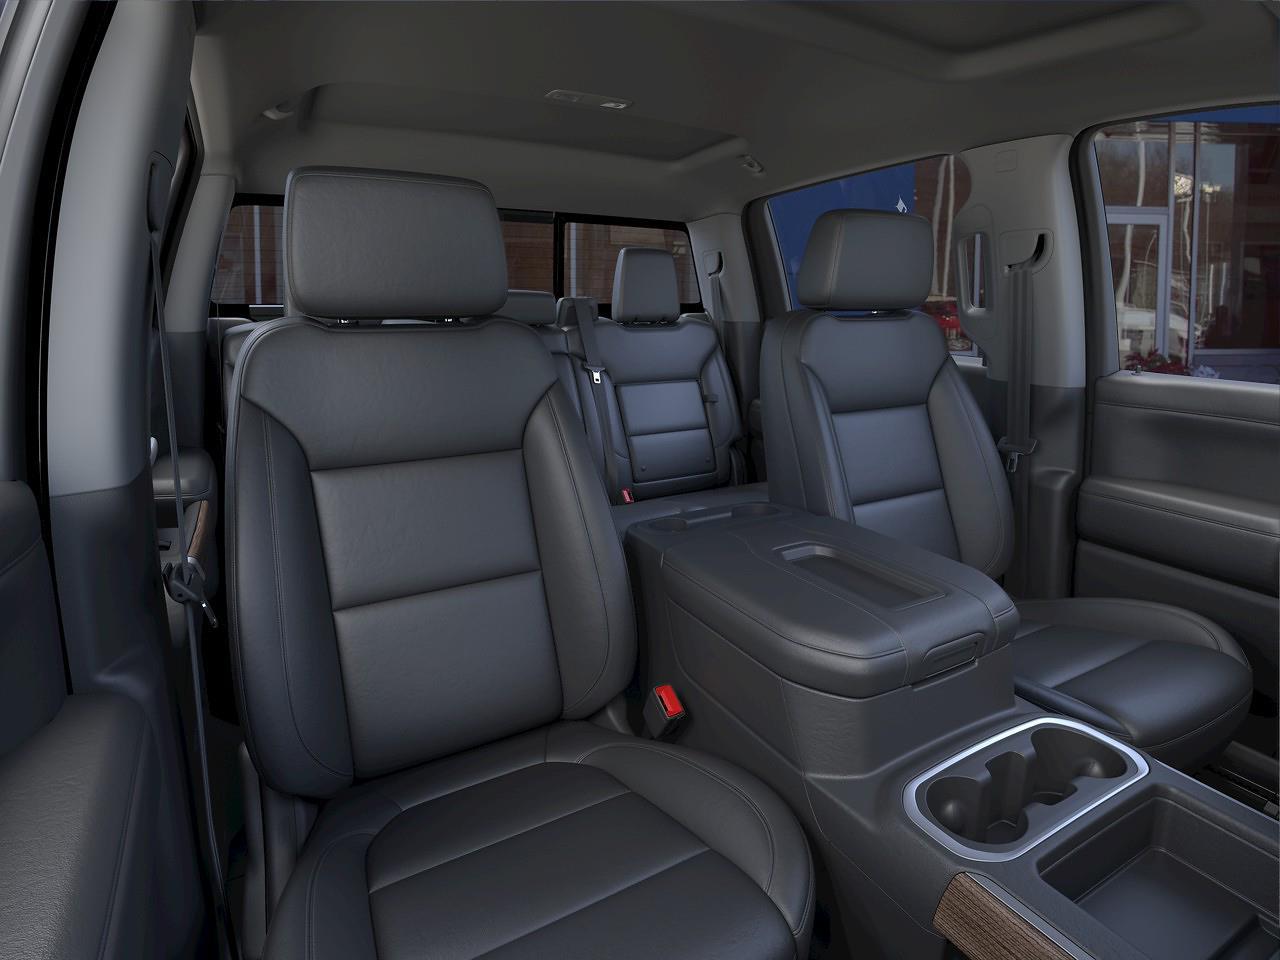 2021 Chevrolet Silverado 1500 Crew Cab 4x4, Pickup #CK1533 - photo 13